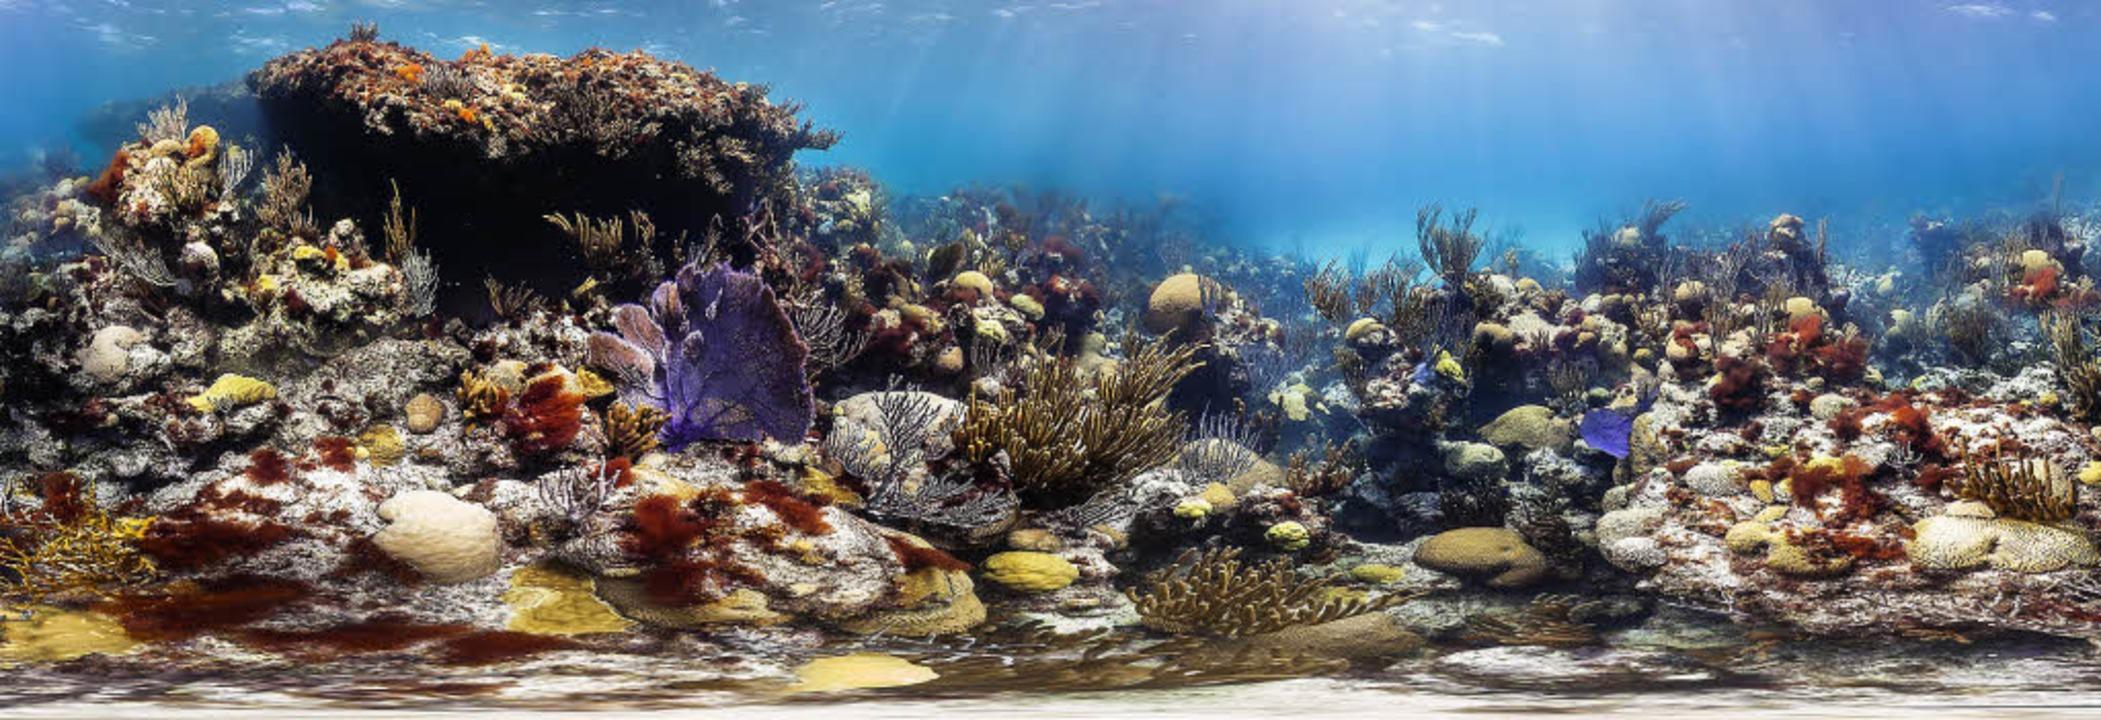 Atemberaubend Korallenriff Färbung Fotos - Framing Malvorlagen ...